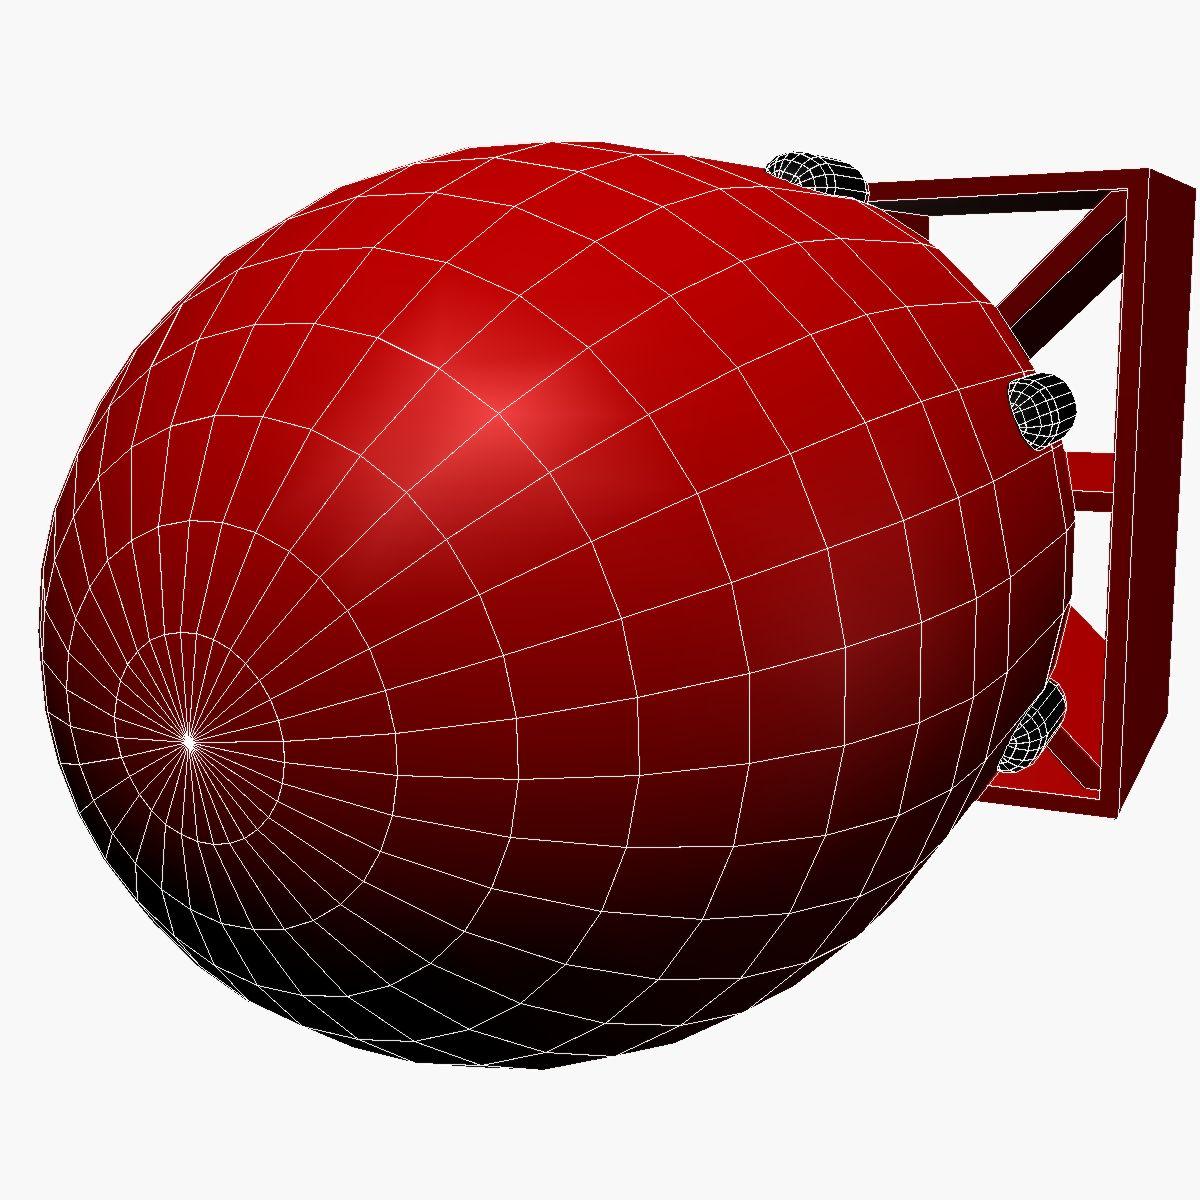 bomb with fatboy scheme 3d model 3ds dxf fbx blend cob dae x obj 162697